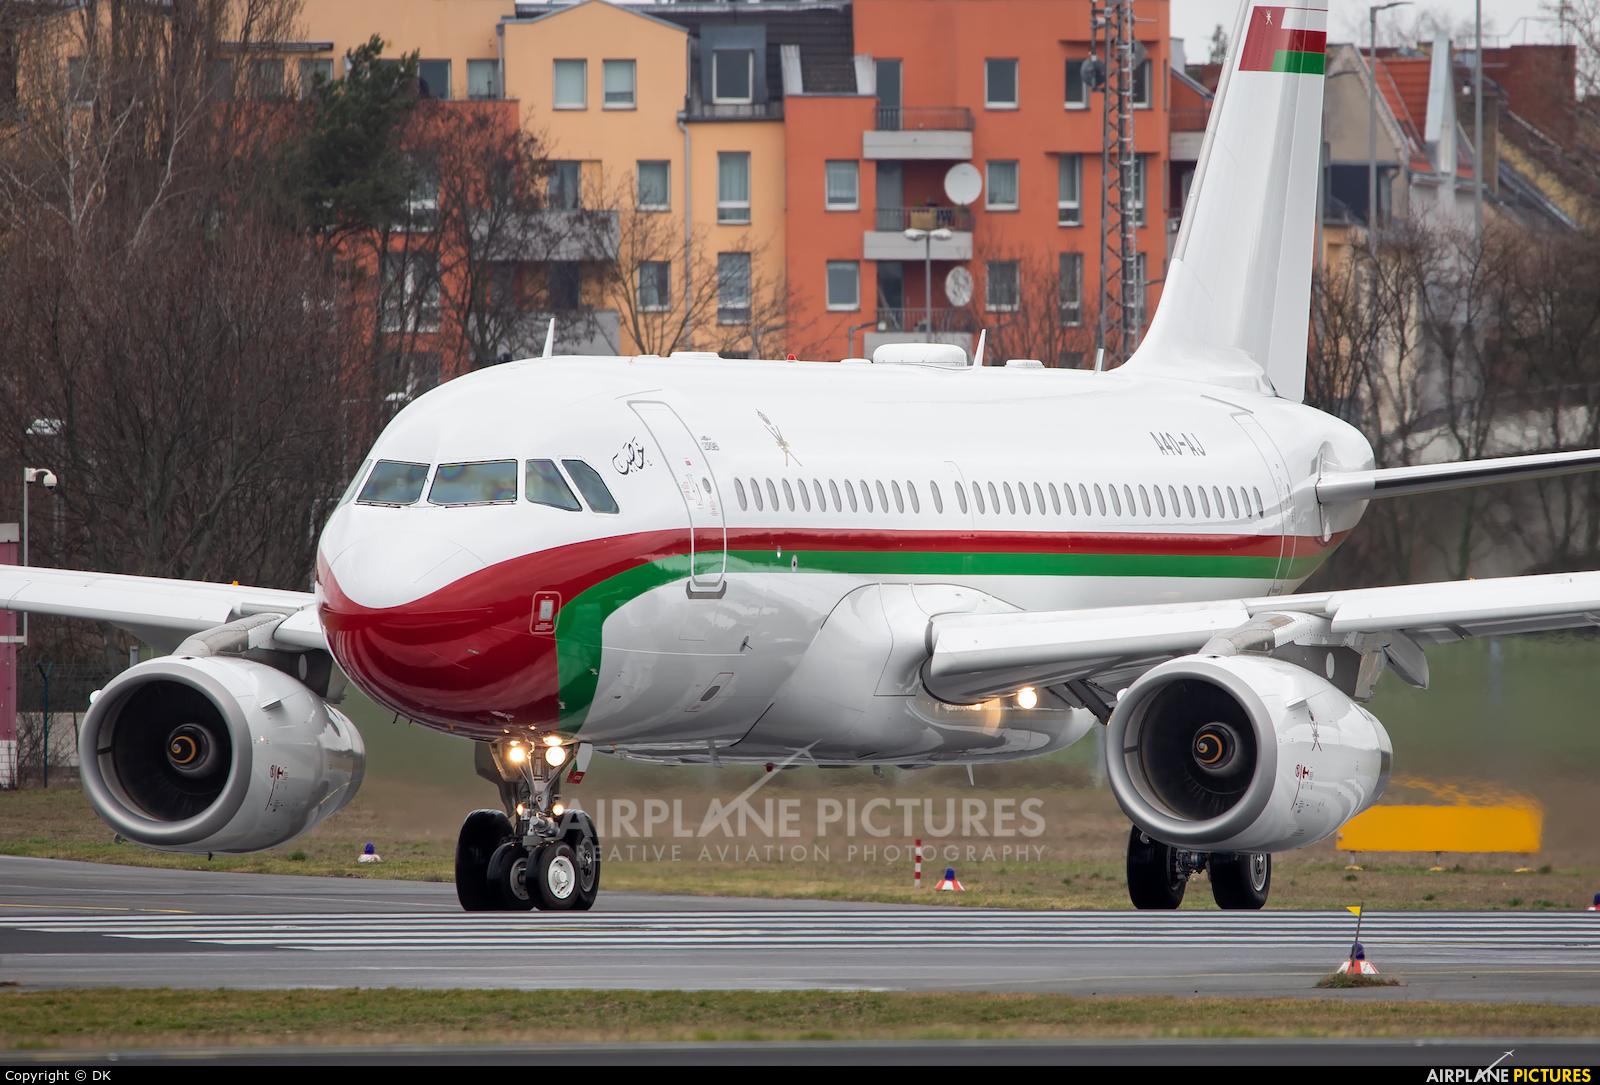 Oman - Royal Flight A4O-AJ aircraft at Berlin - Tegel